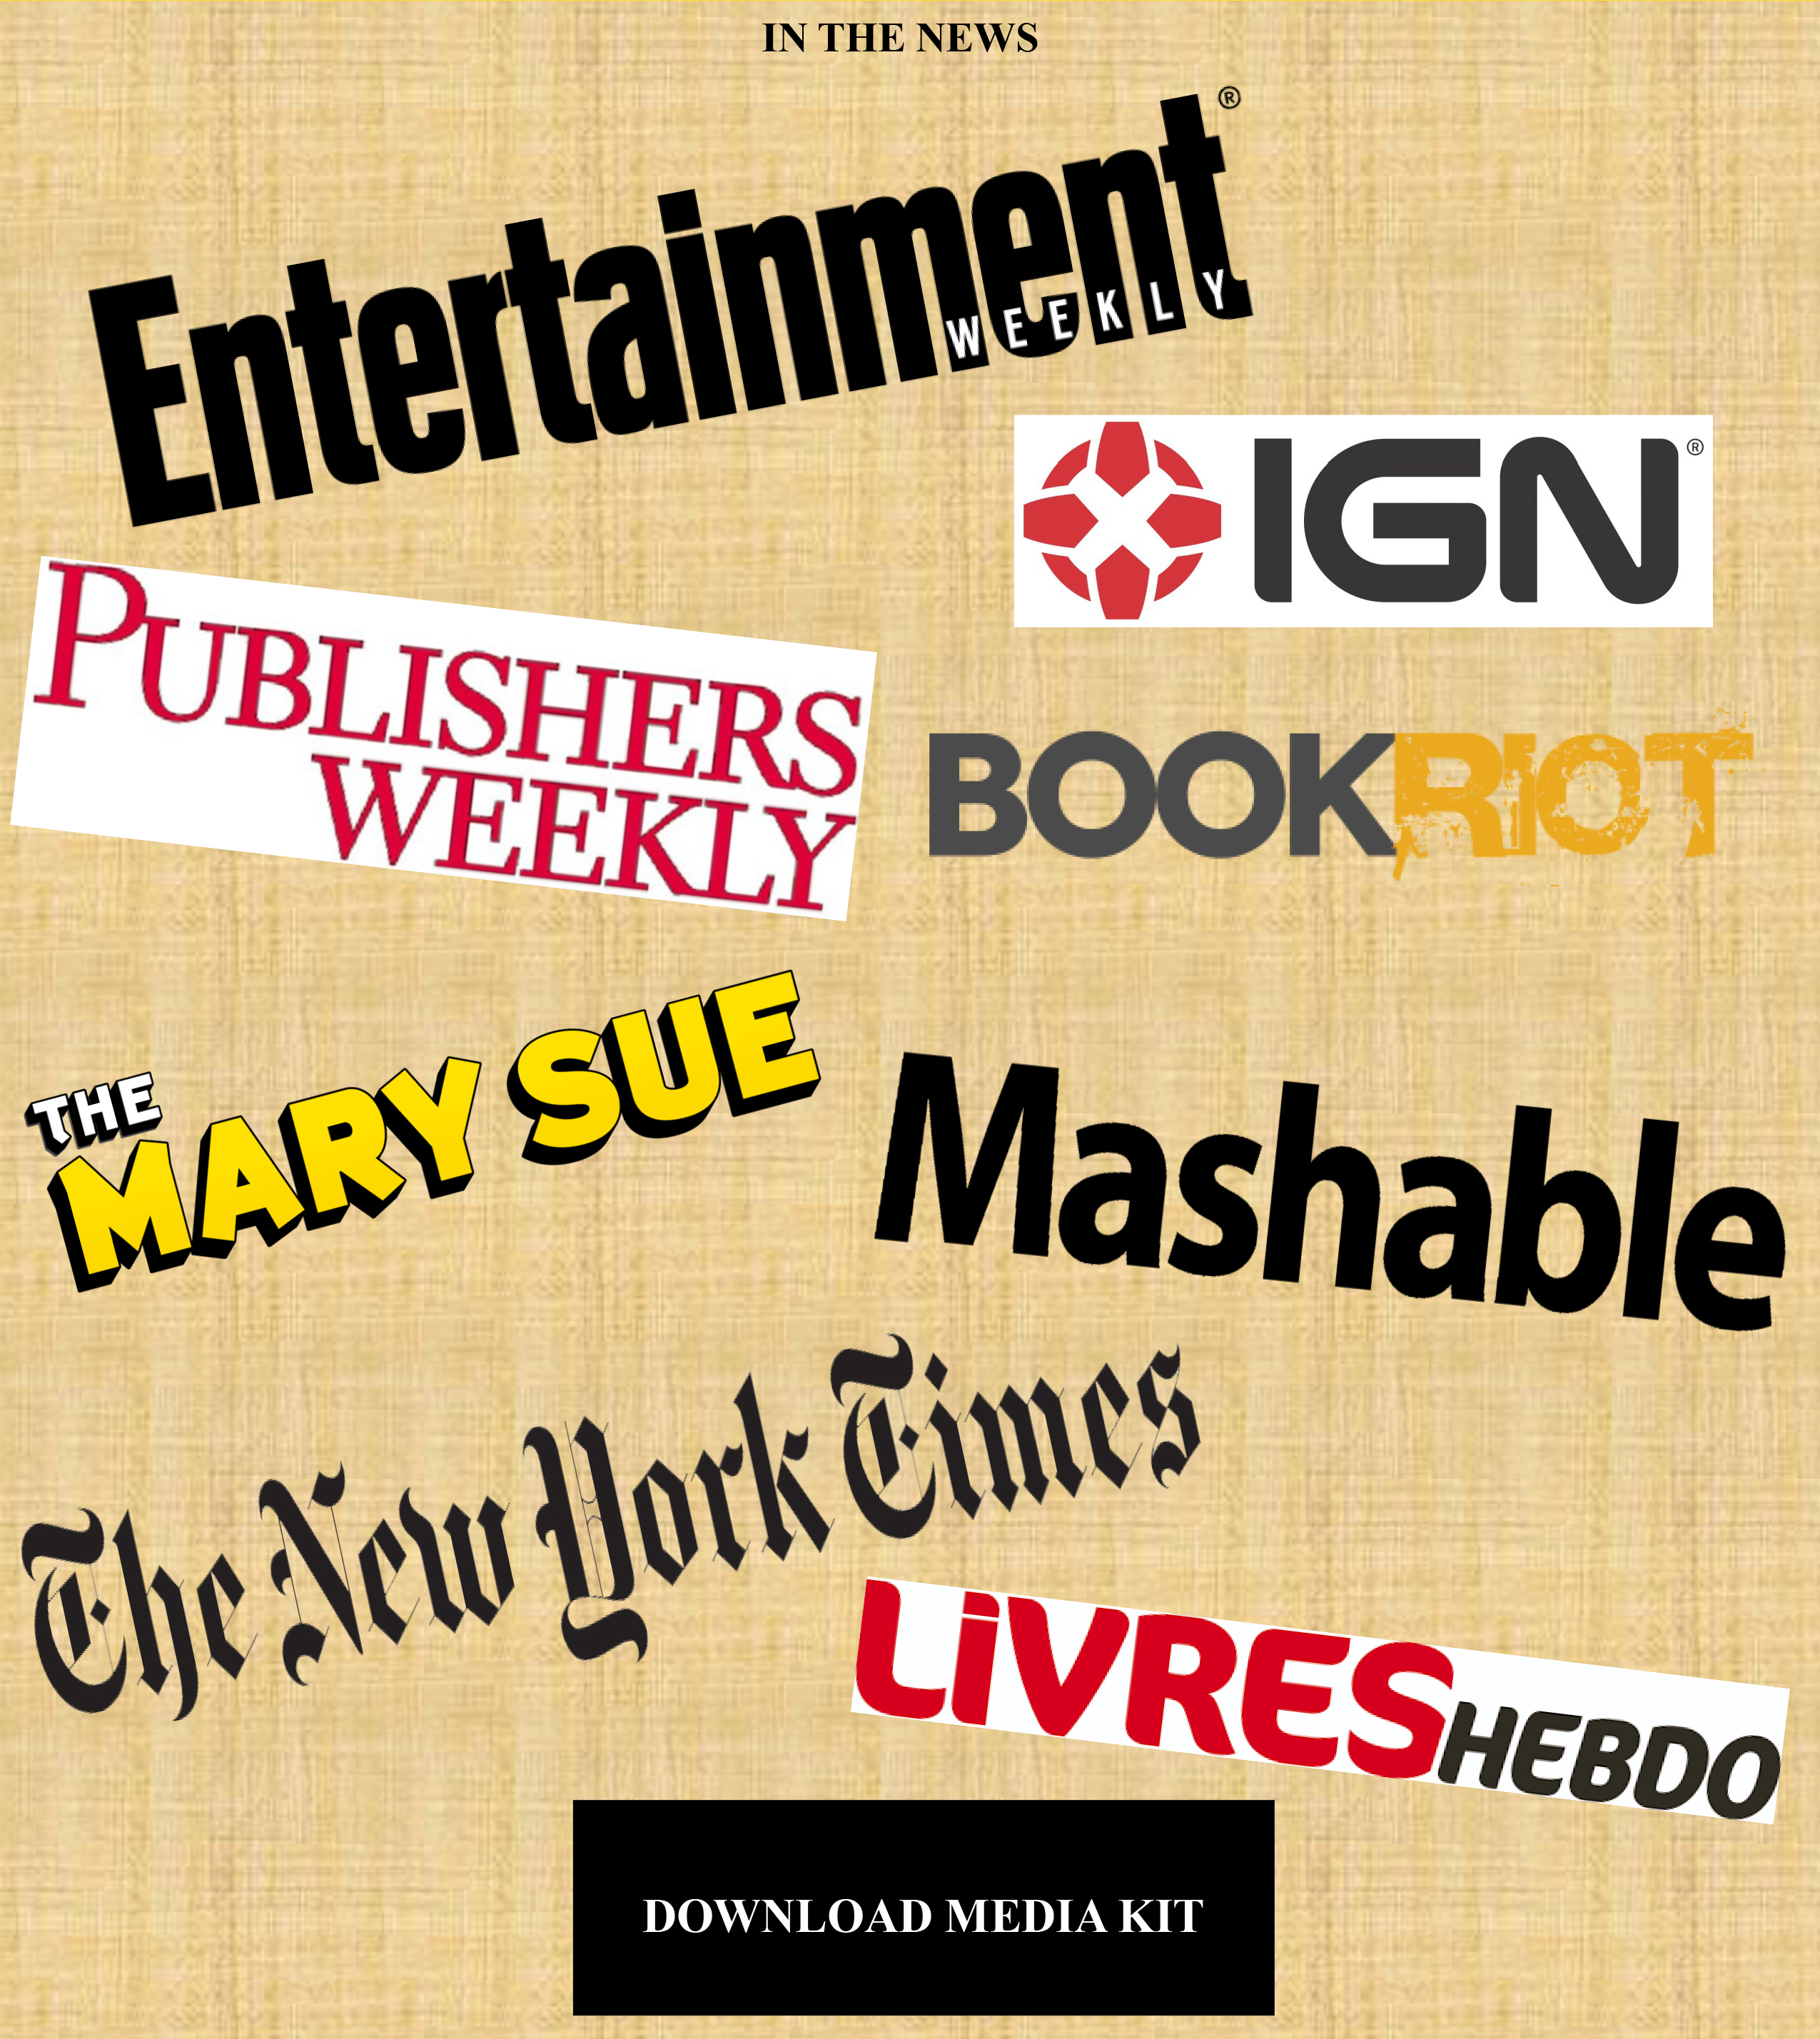 GraphicAudio Media Kit PDF Link